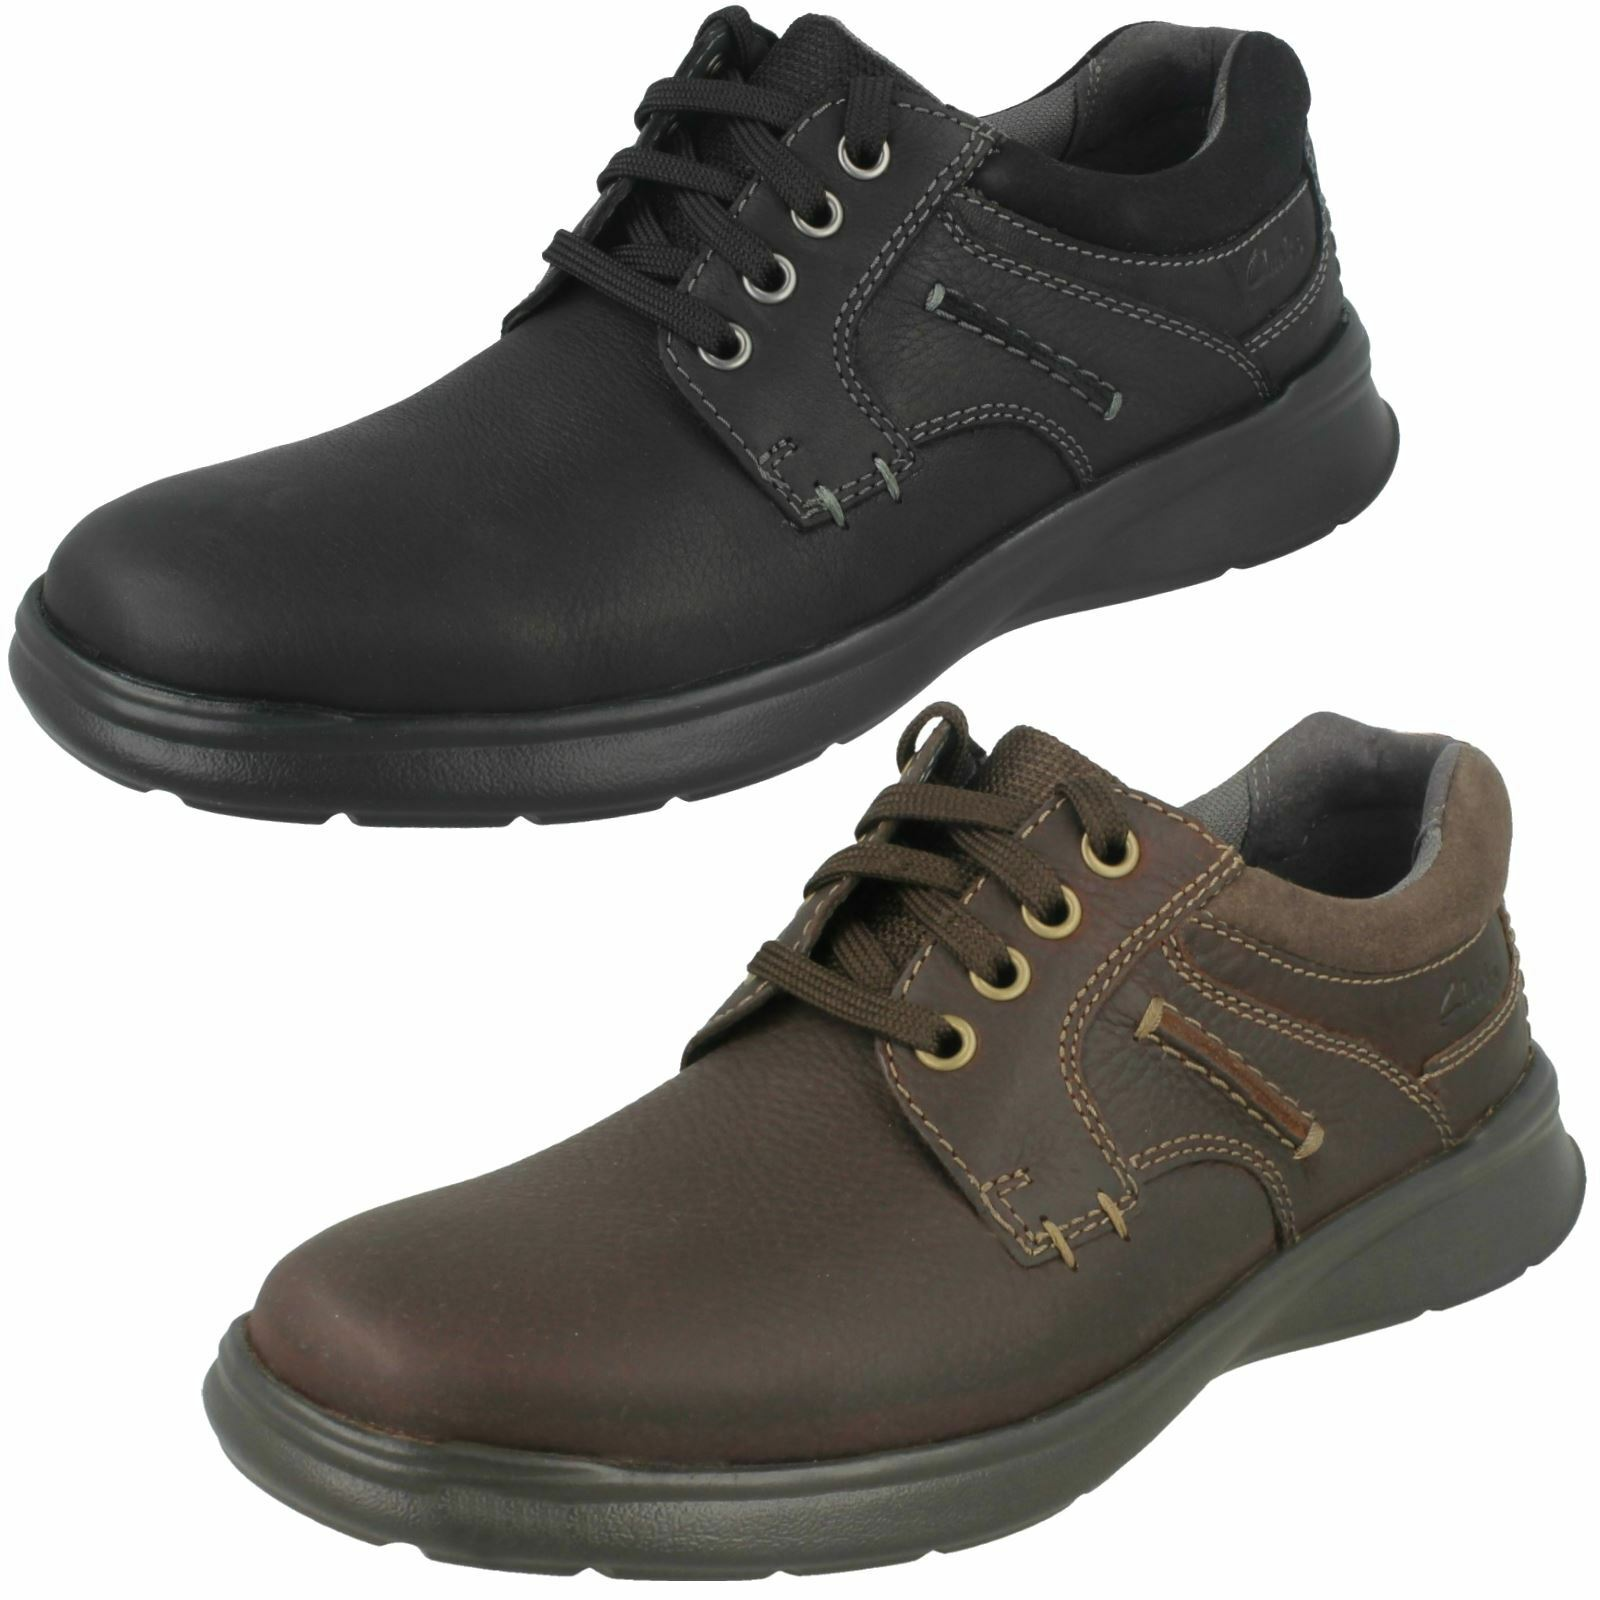 Mens Clarks Casual shoes 'Cotrell Plain'